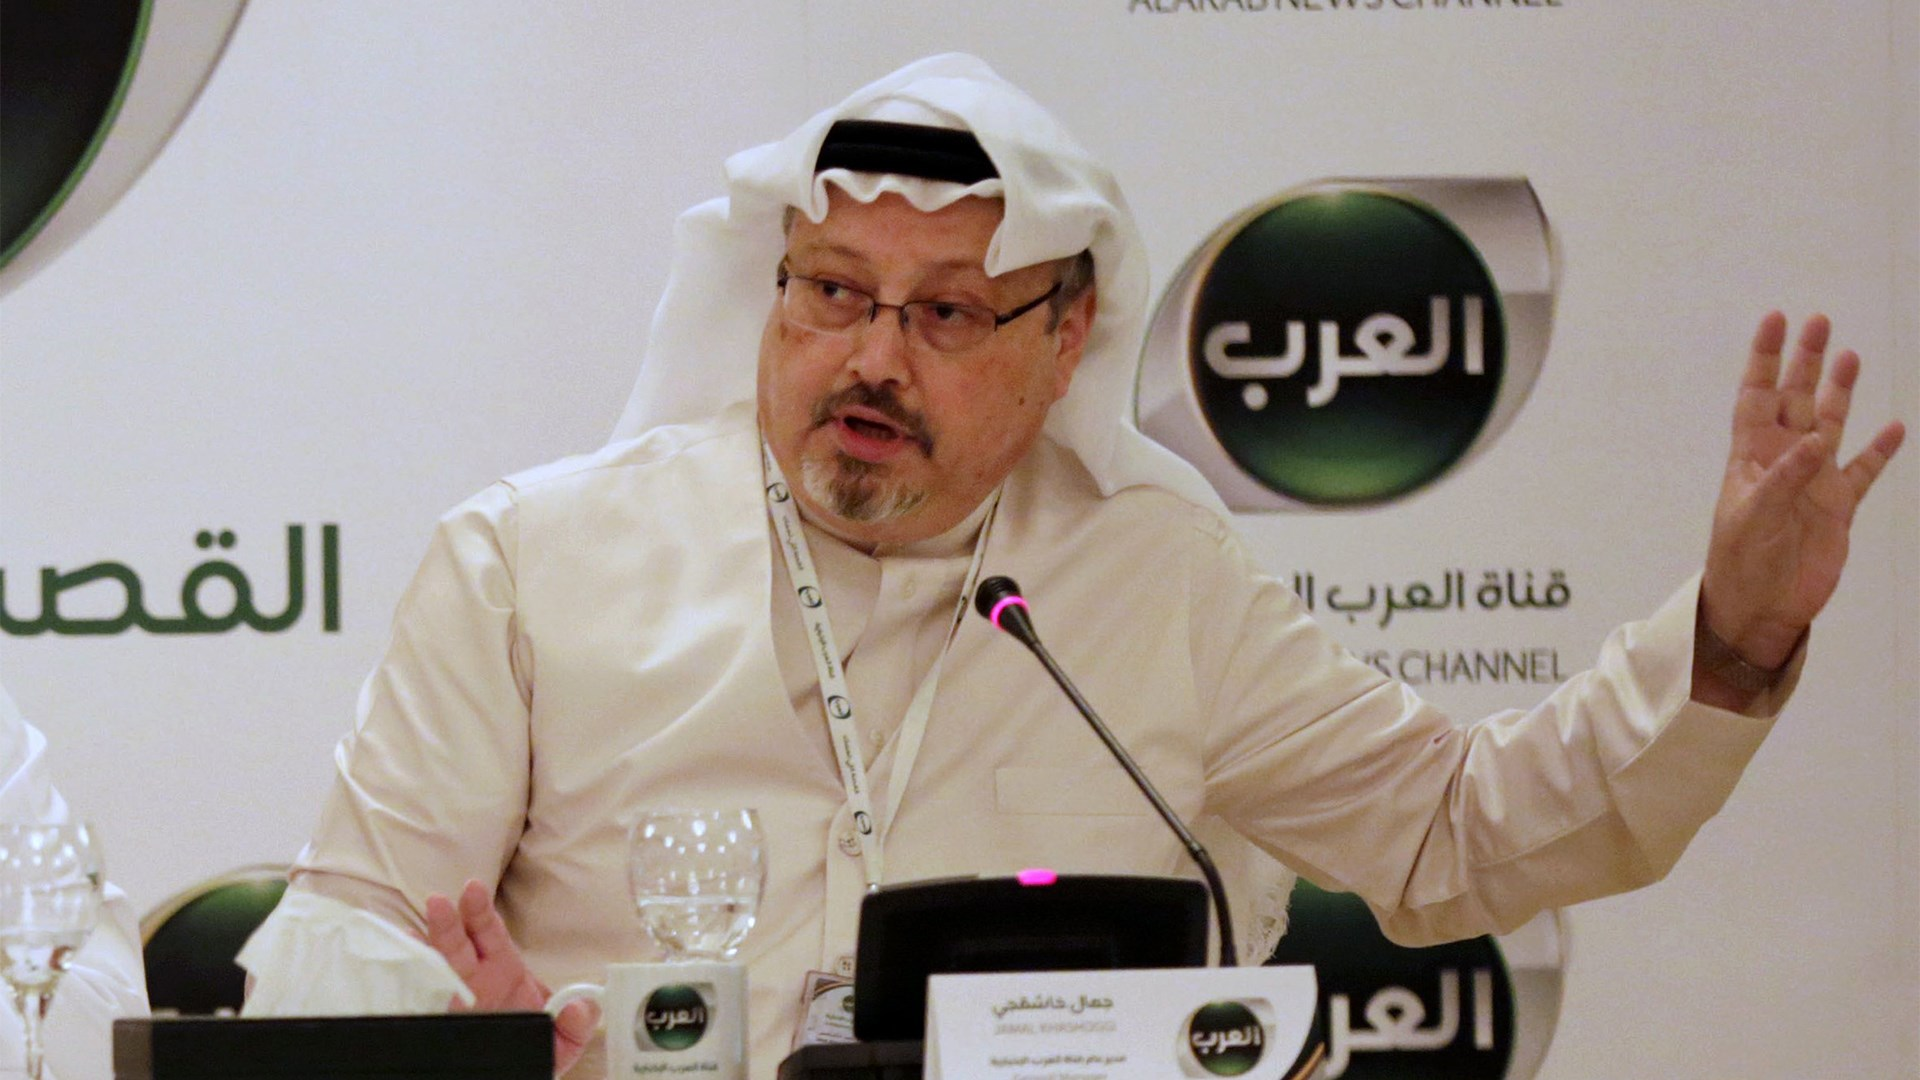 U.S. bans 16 Saudi individuals from U.S. for role in Khashoggi's murder